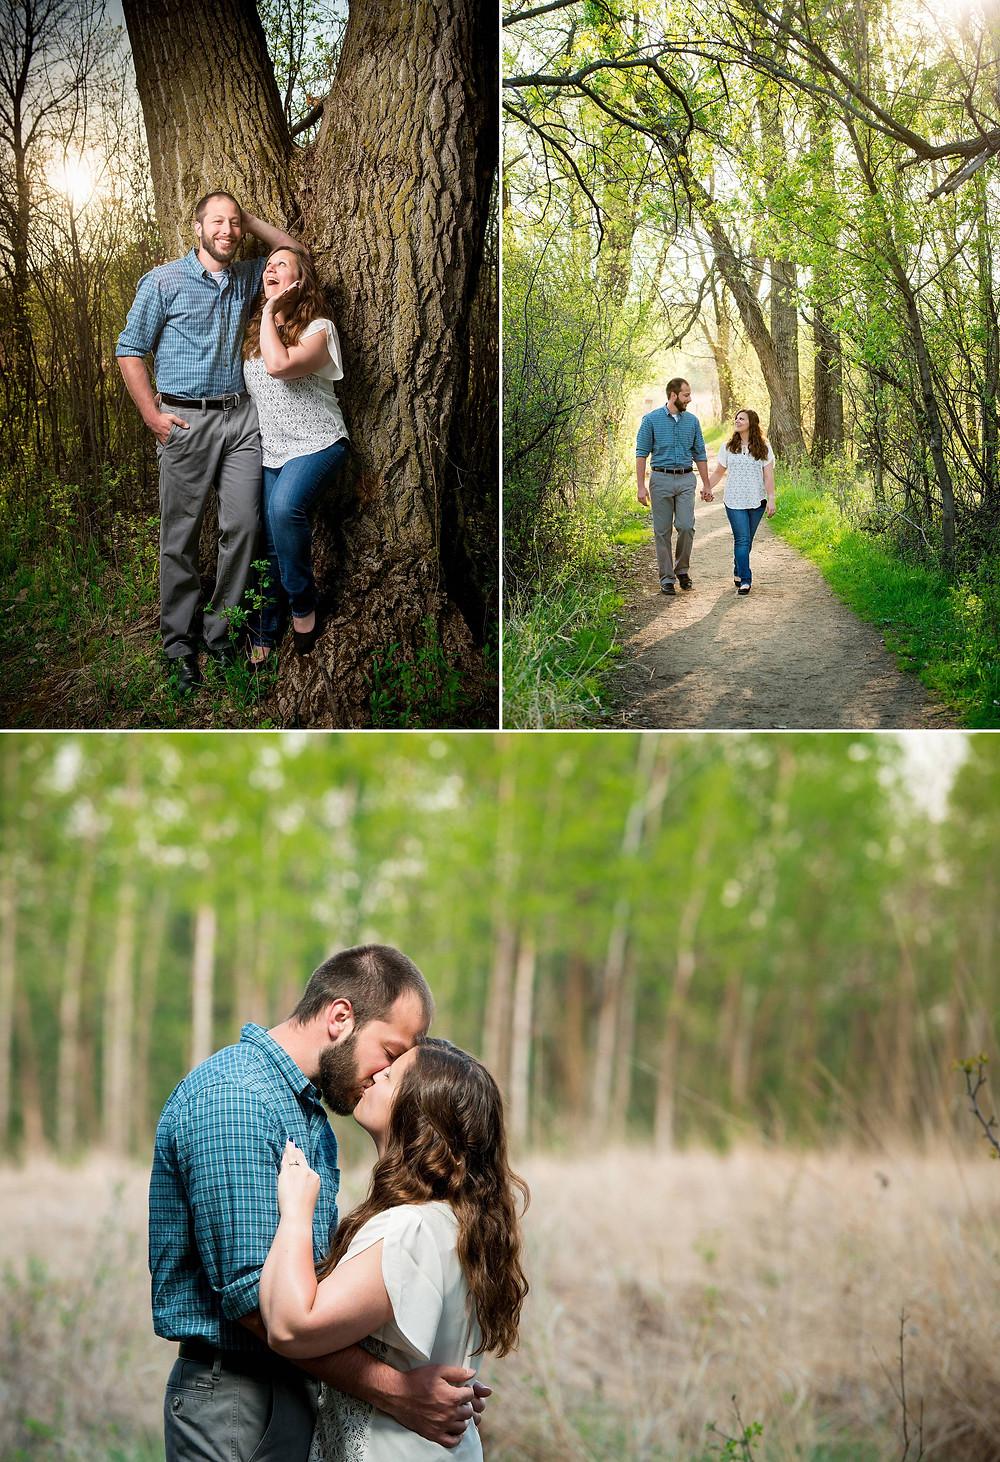 Spring Engagement Photos Wisconsin | Lanari Photography